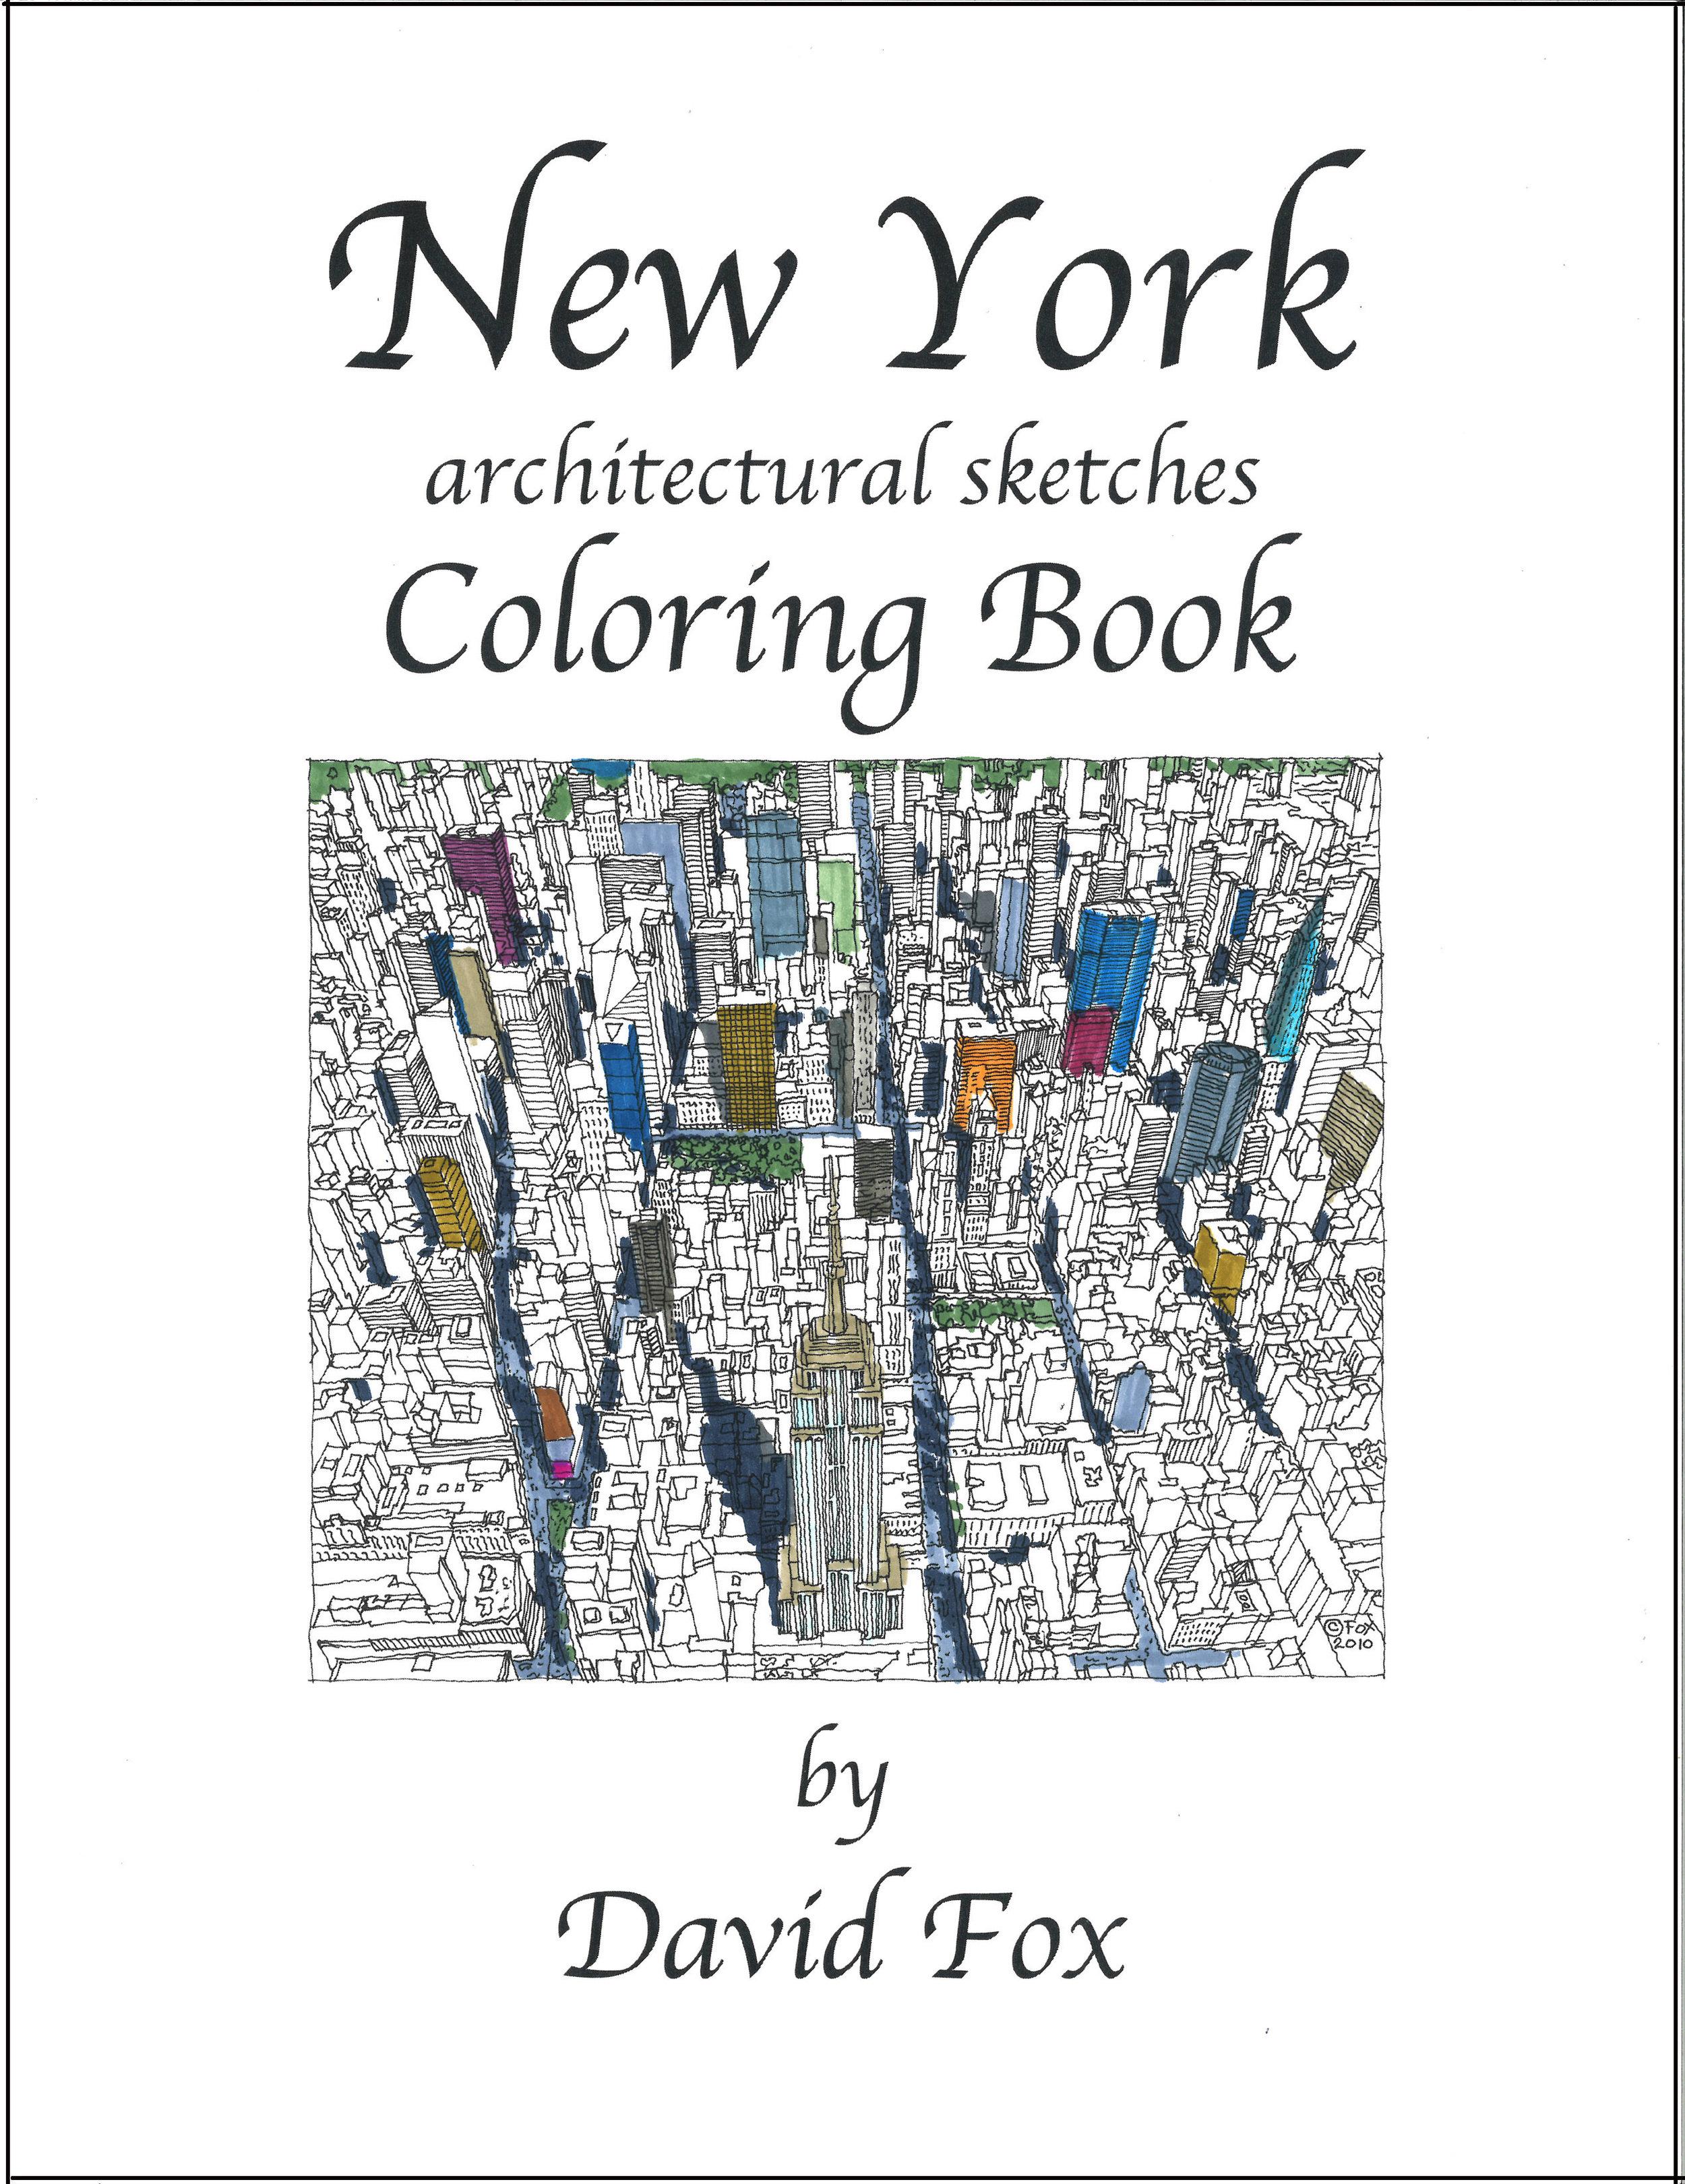 NYCBK COVER W- LINES -1.jpg